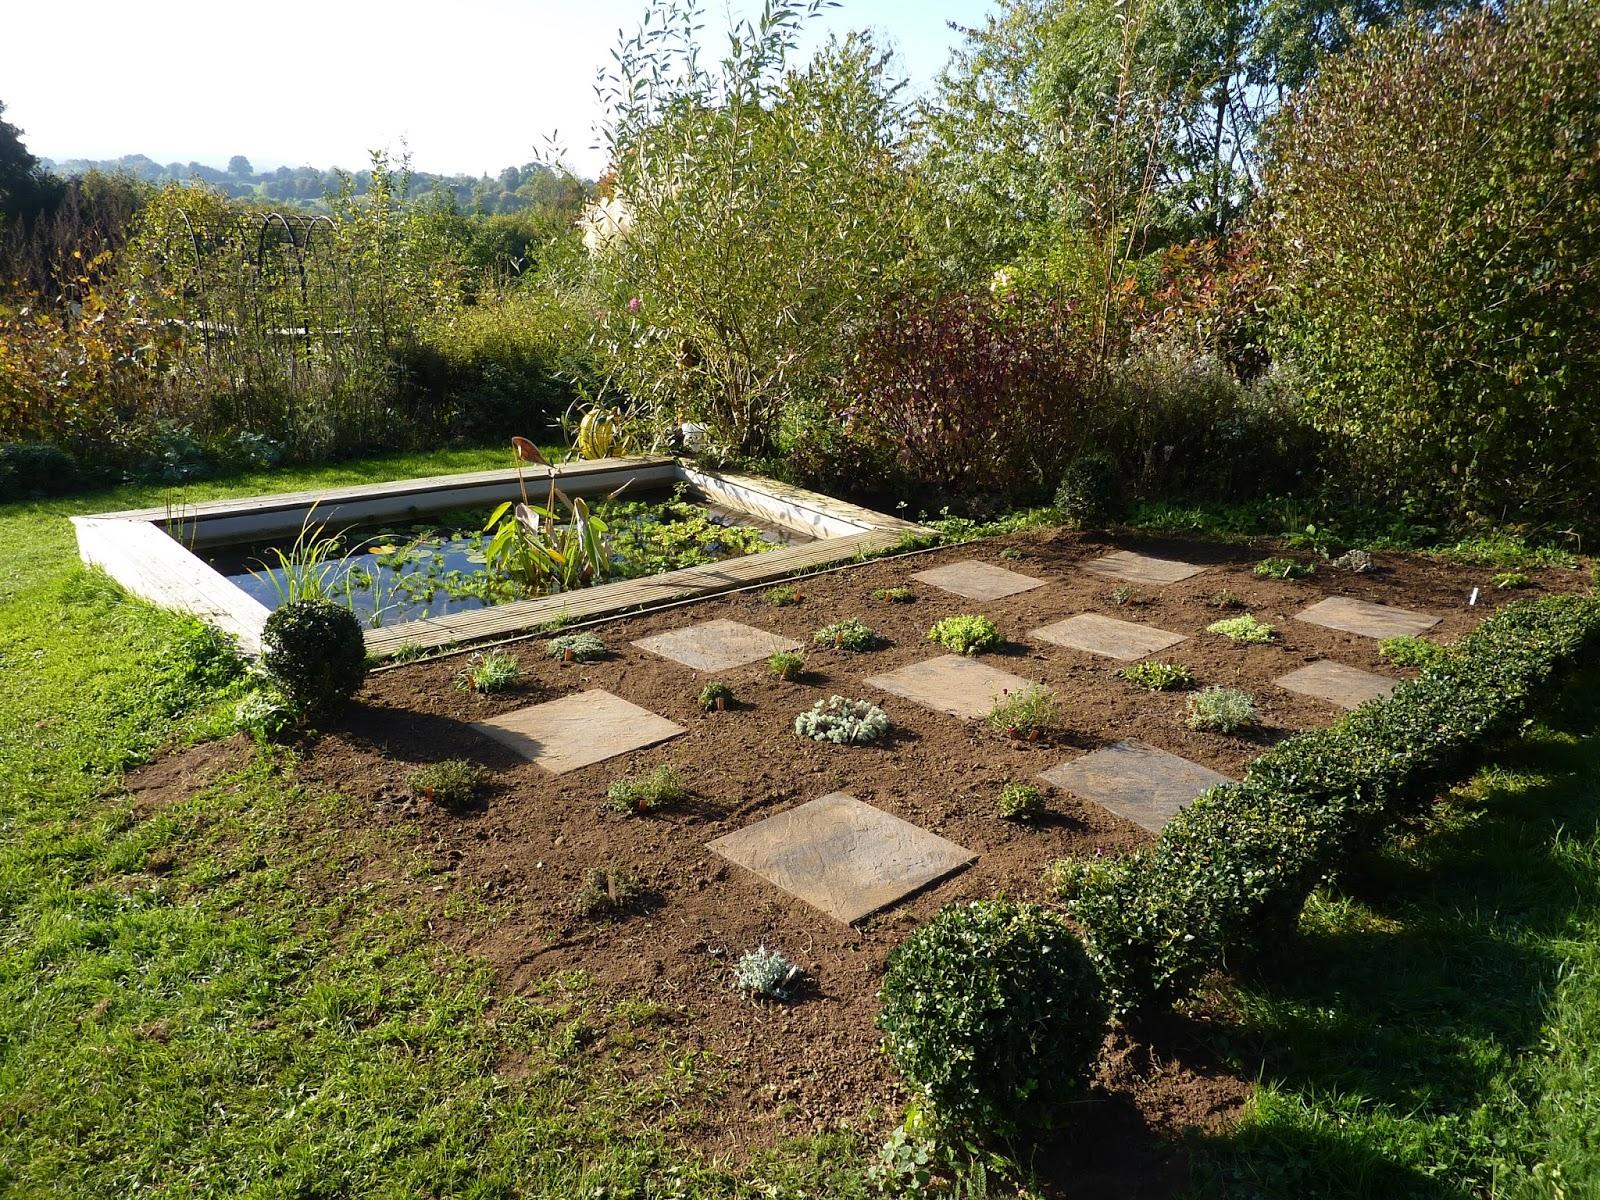 Le jardin de la fol terie avril 2016 for Jardin d aywiers 2016